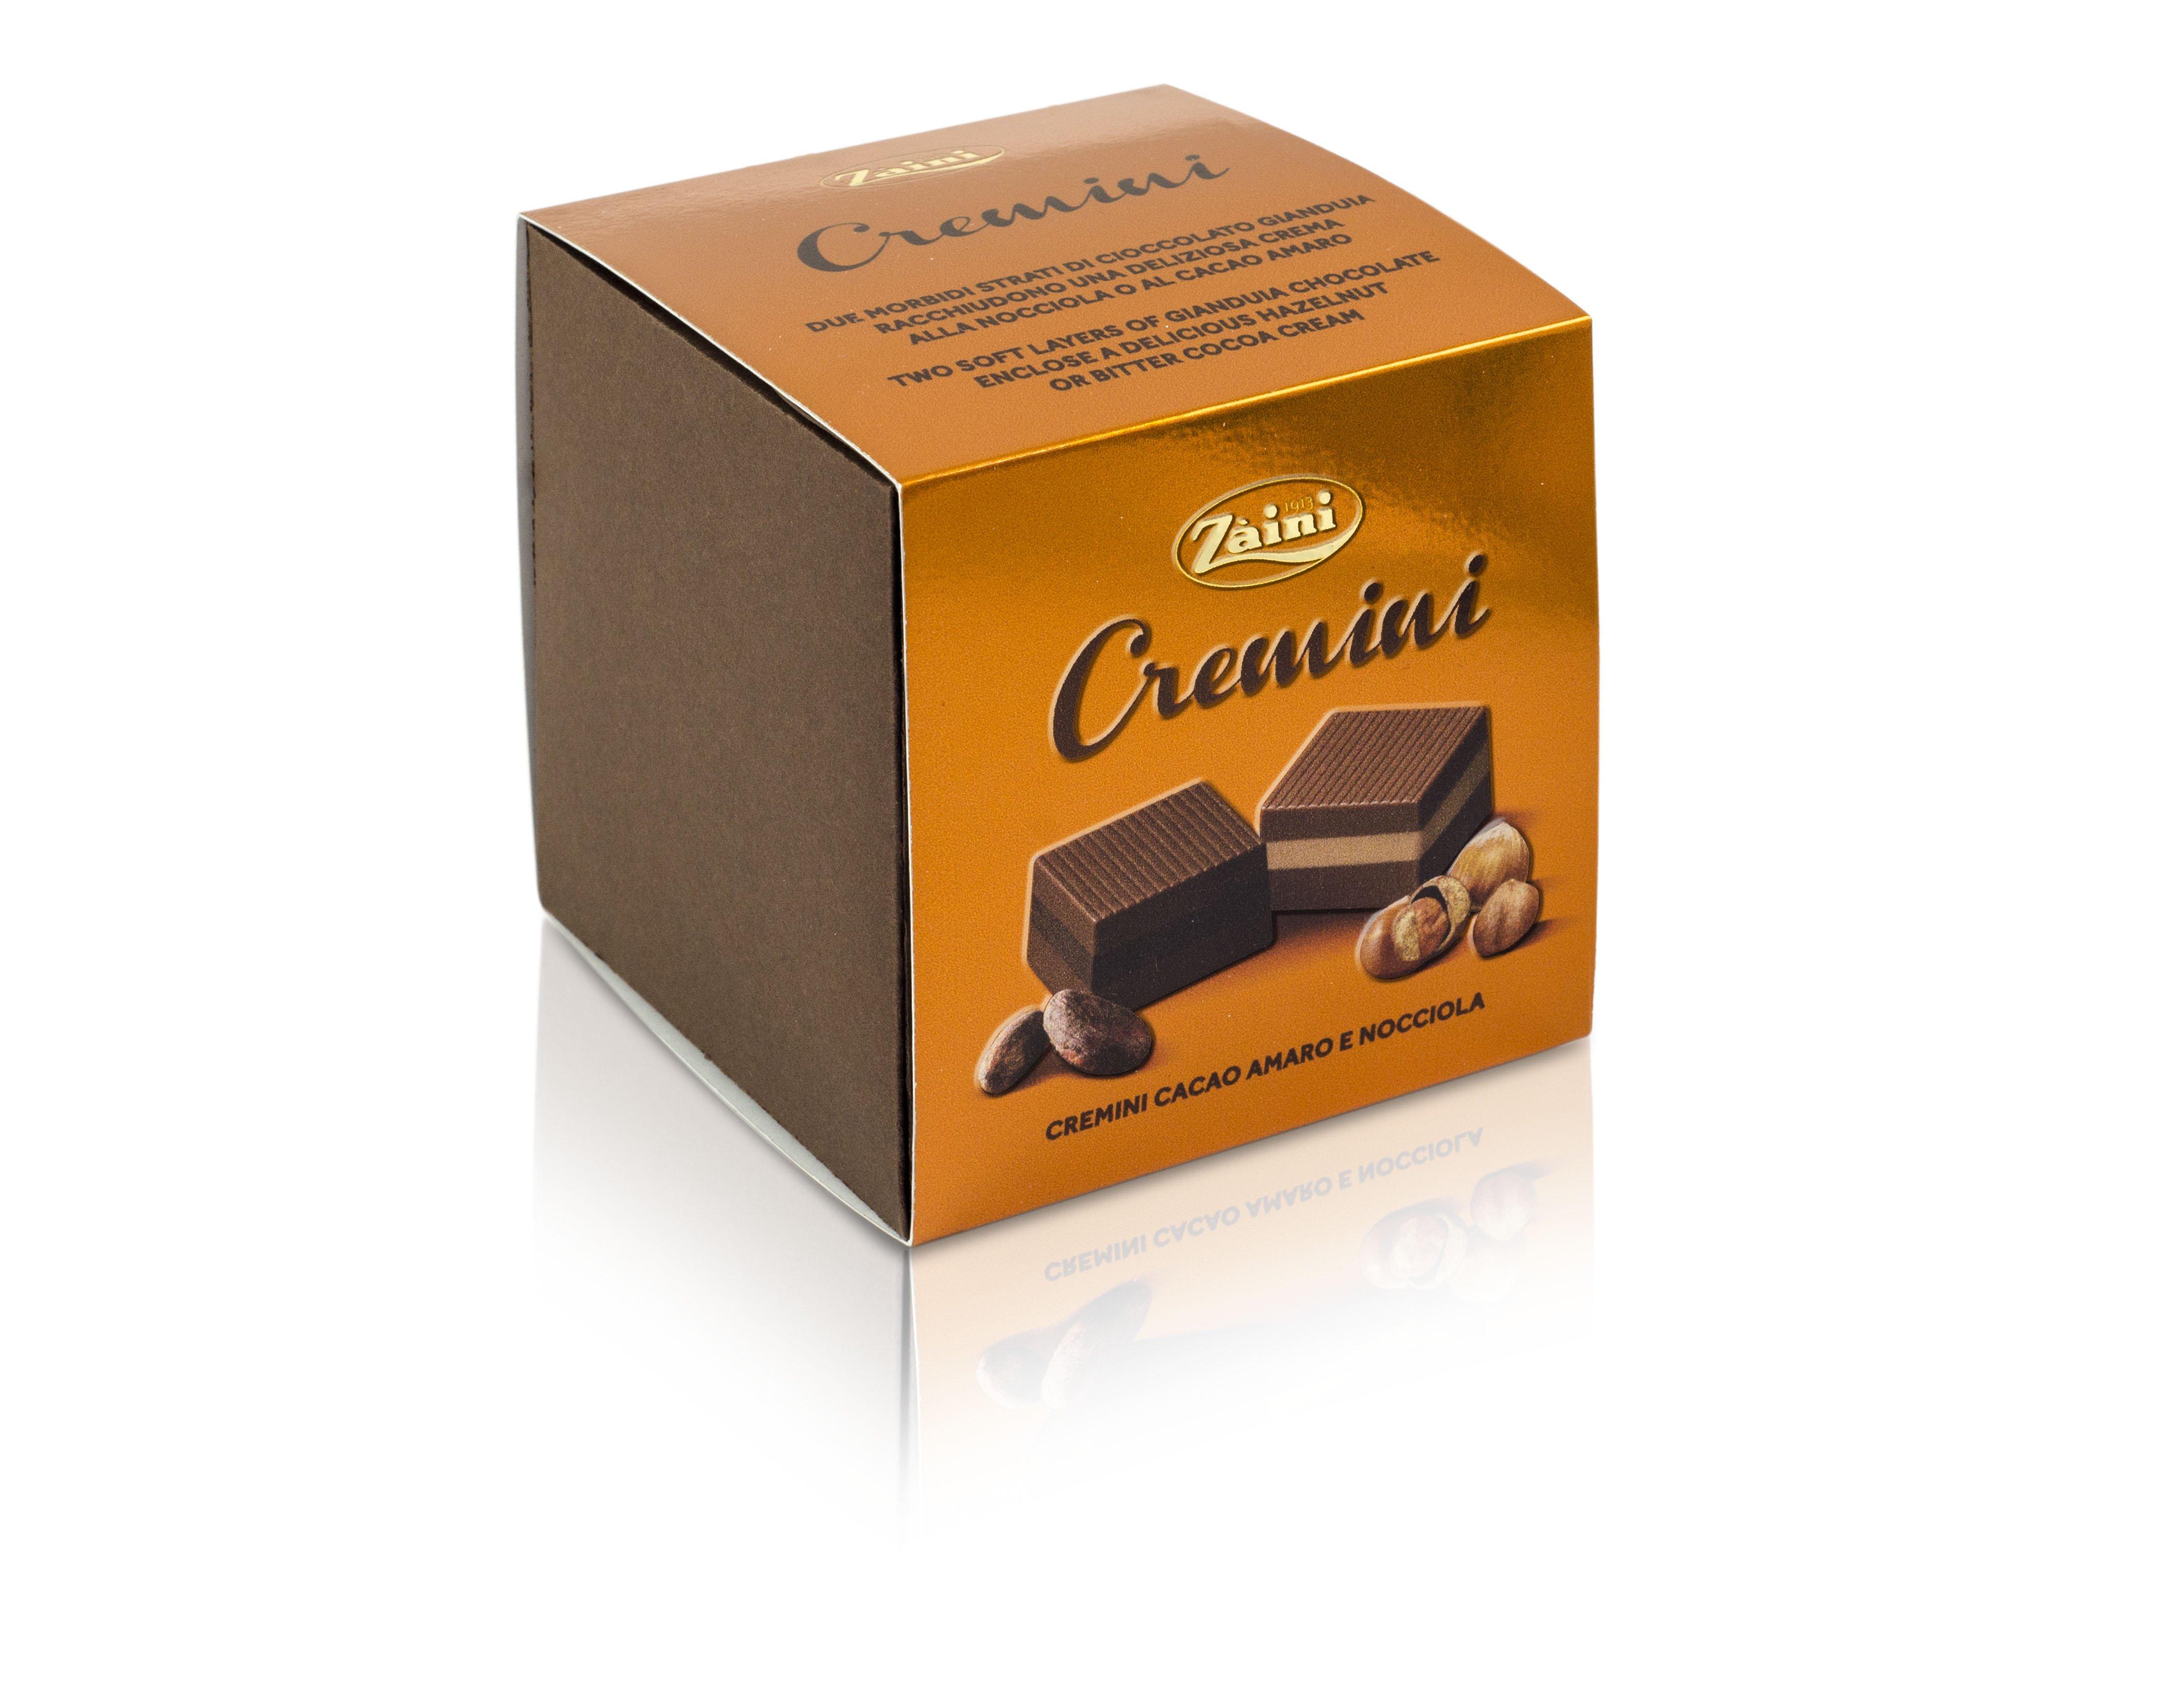 Zaini Cremini Dark Cocoa Hazelnut Chocolates 200g